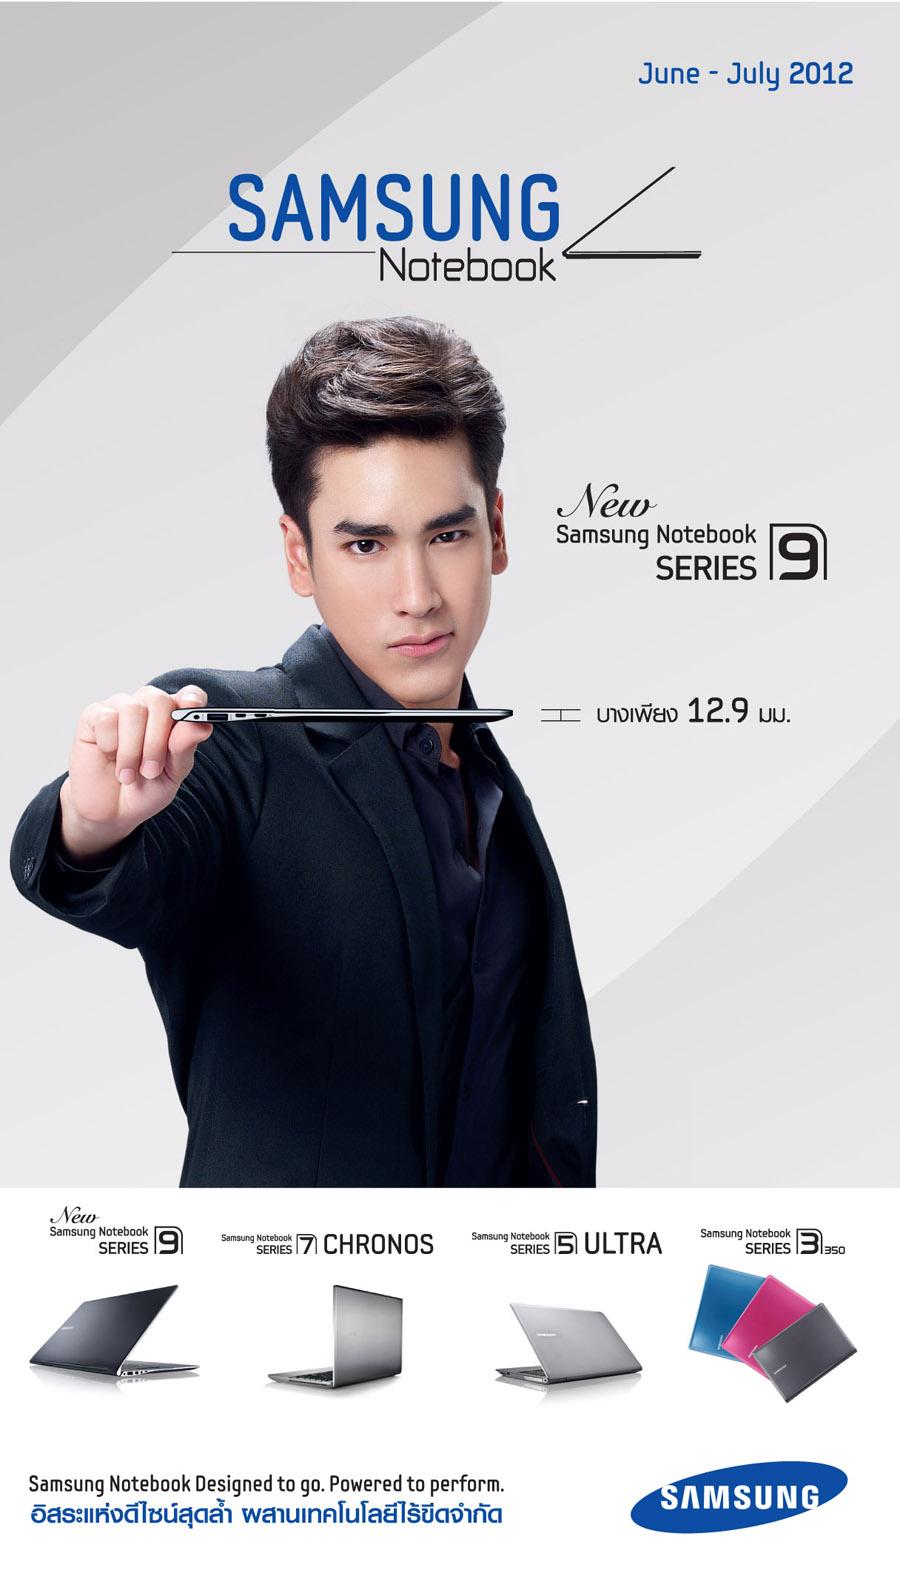 Samsung Notebook P1abcde1